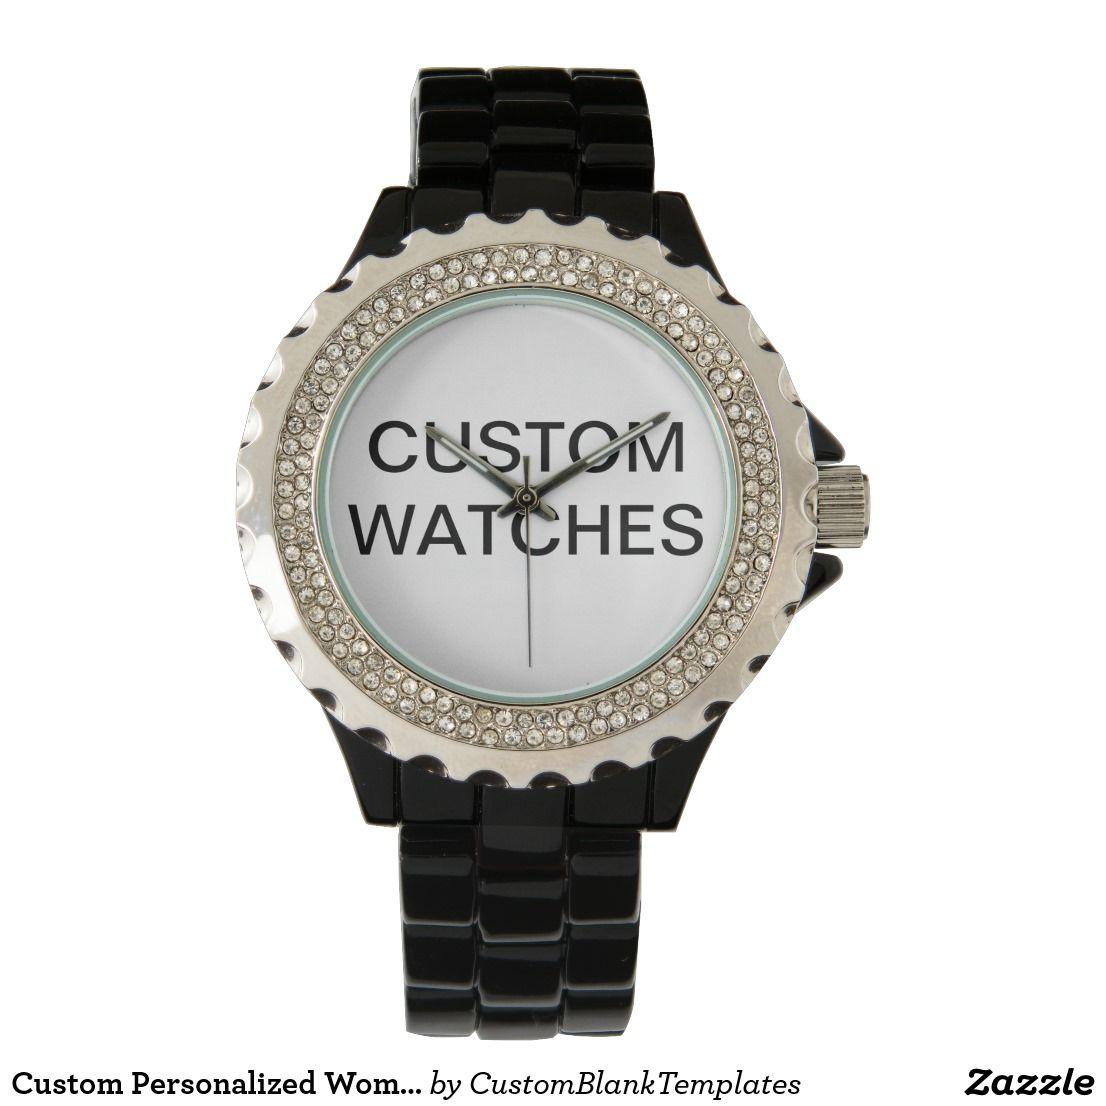 Custom Personalized Woman's Rhinestone Watch Blank